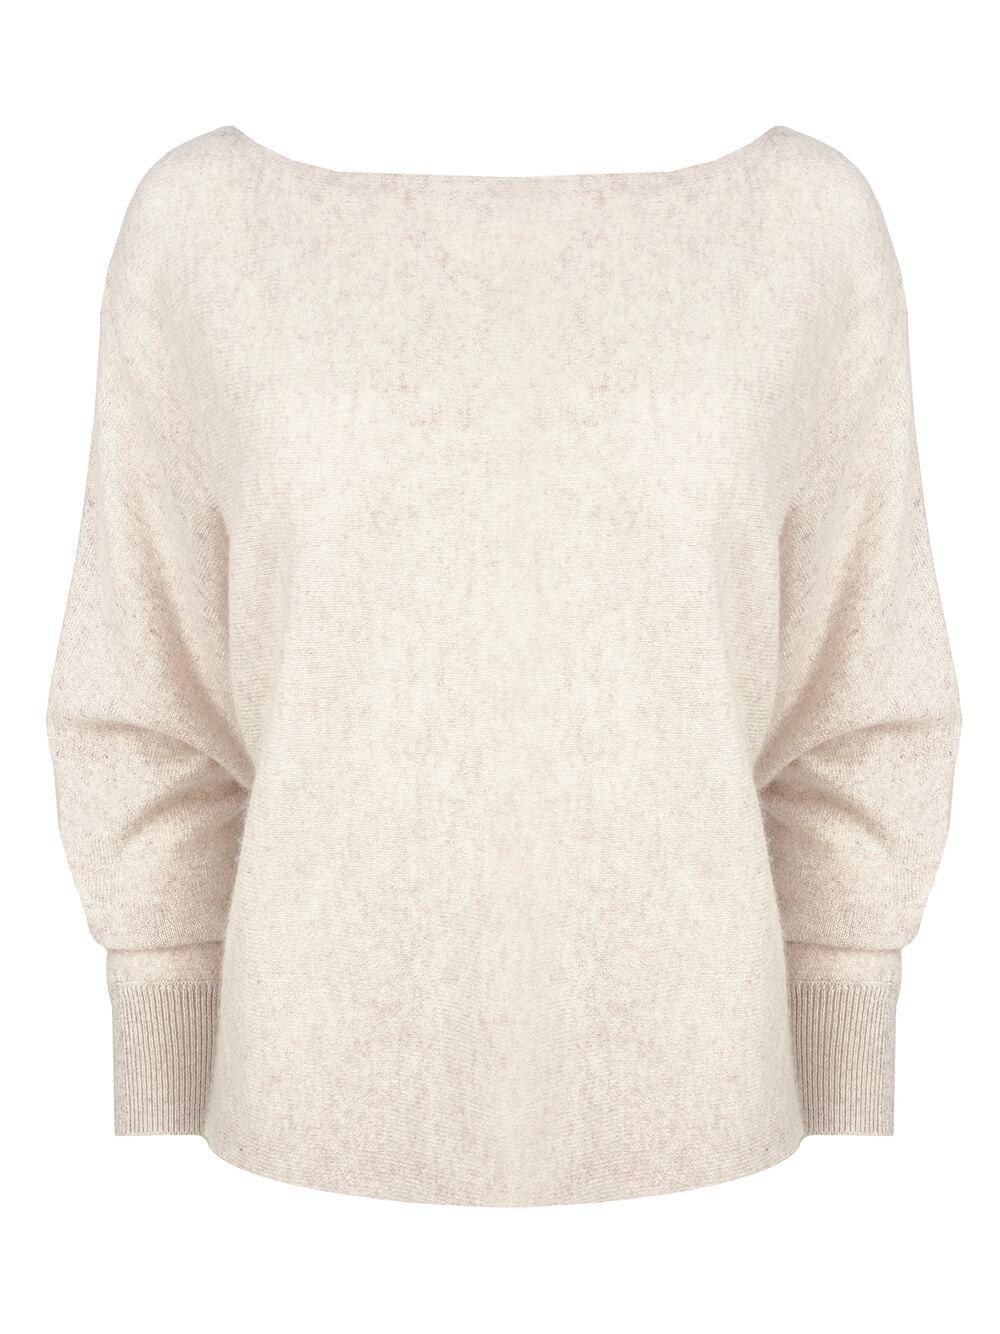 Juliet Off Shoulder Sweater Item # JULIET05